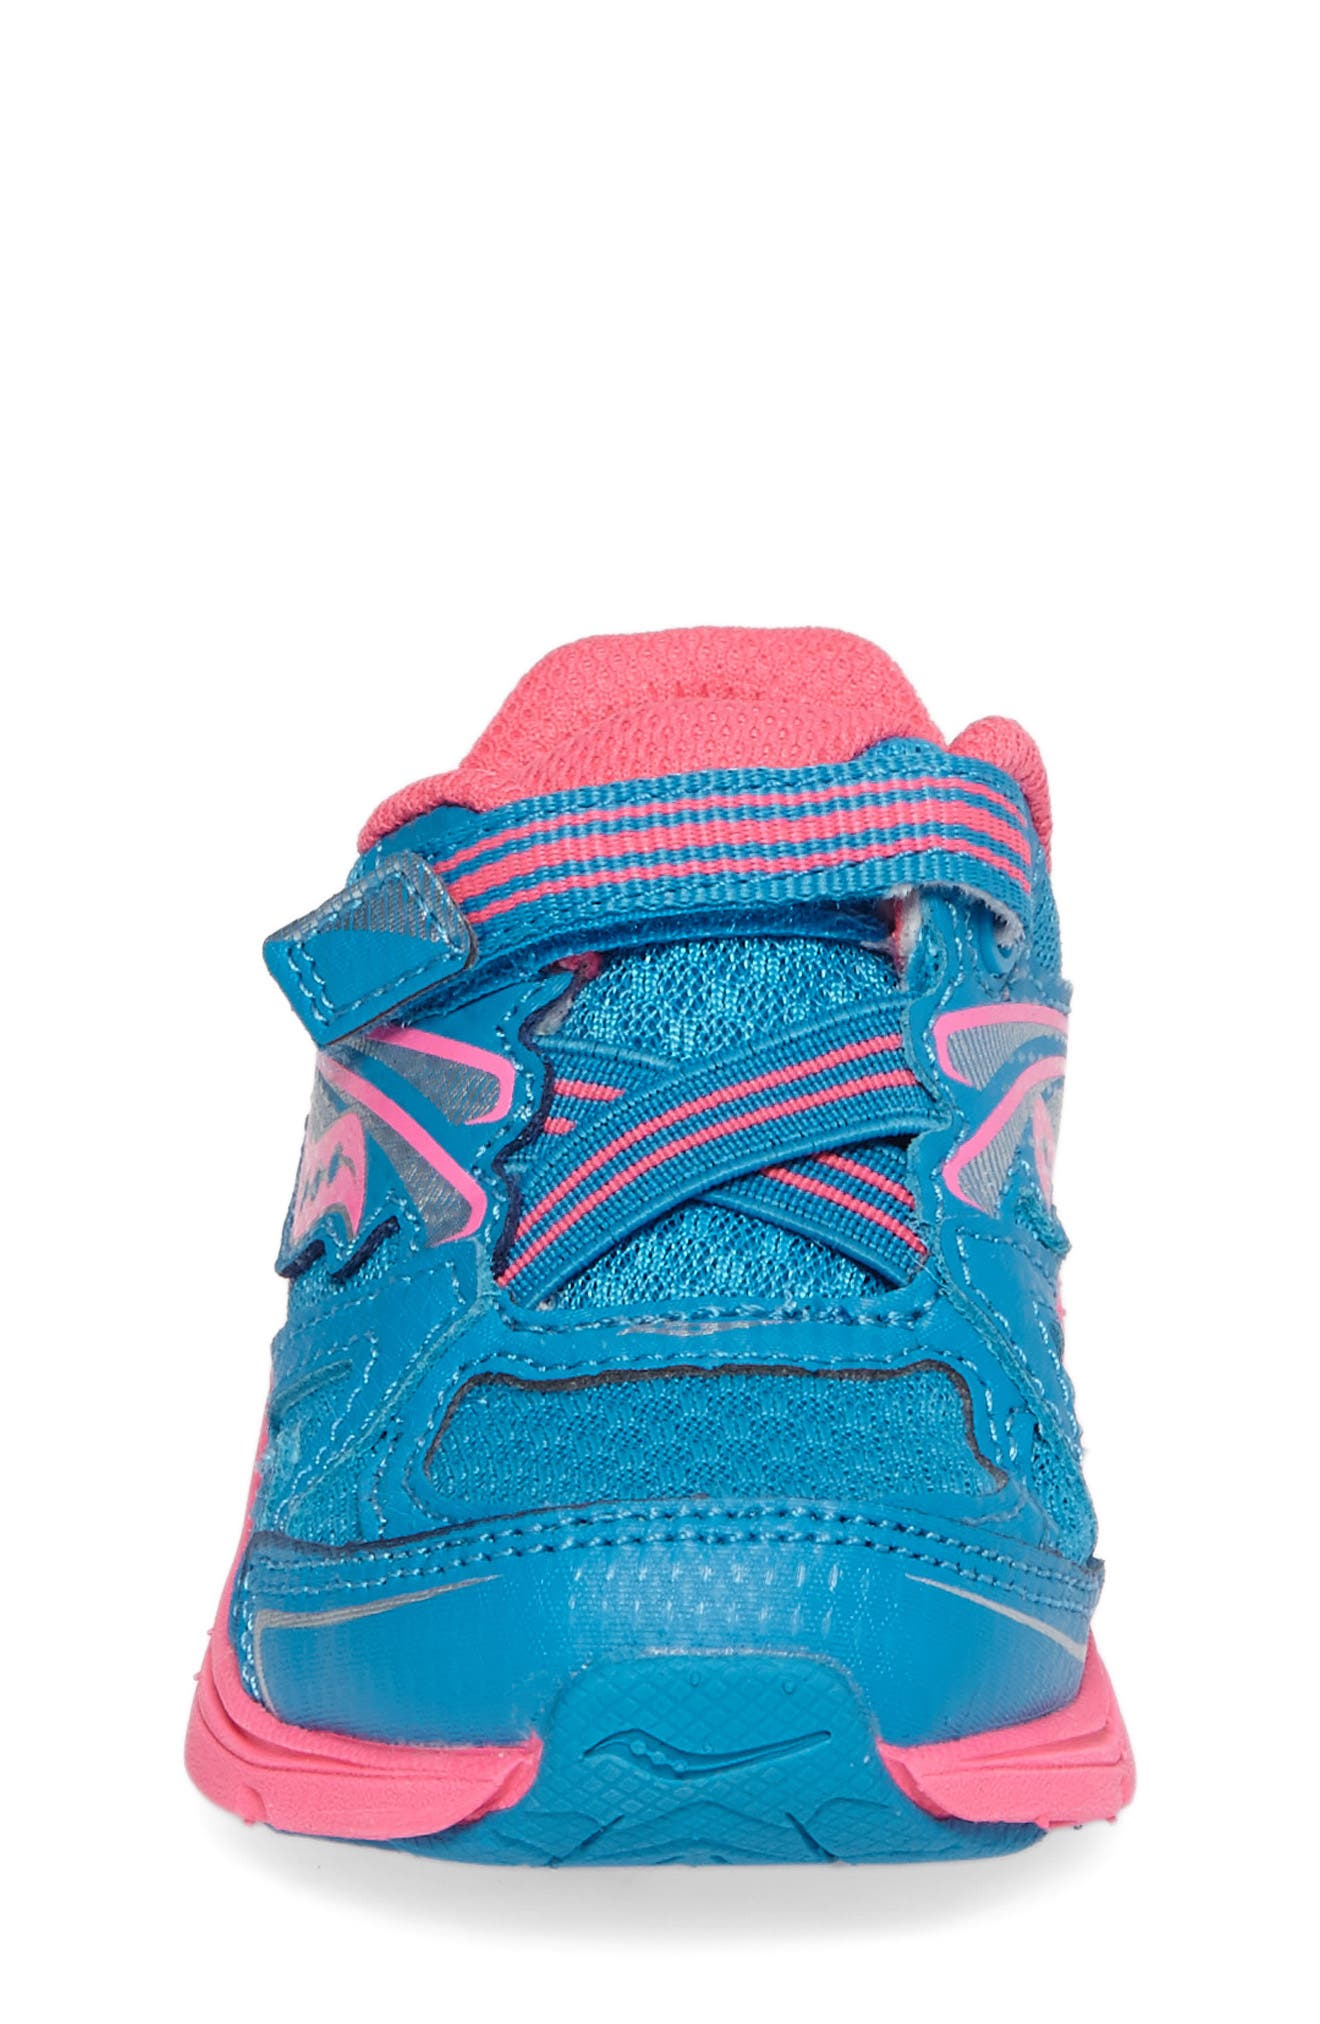 'Baby Ride' Sneaker,                             Alternate thumbnail 4, color,                             401